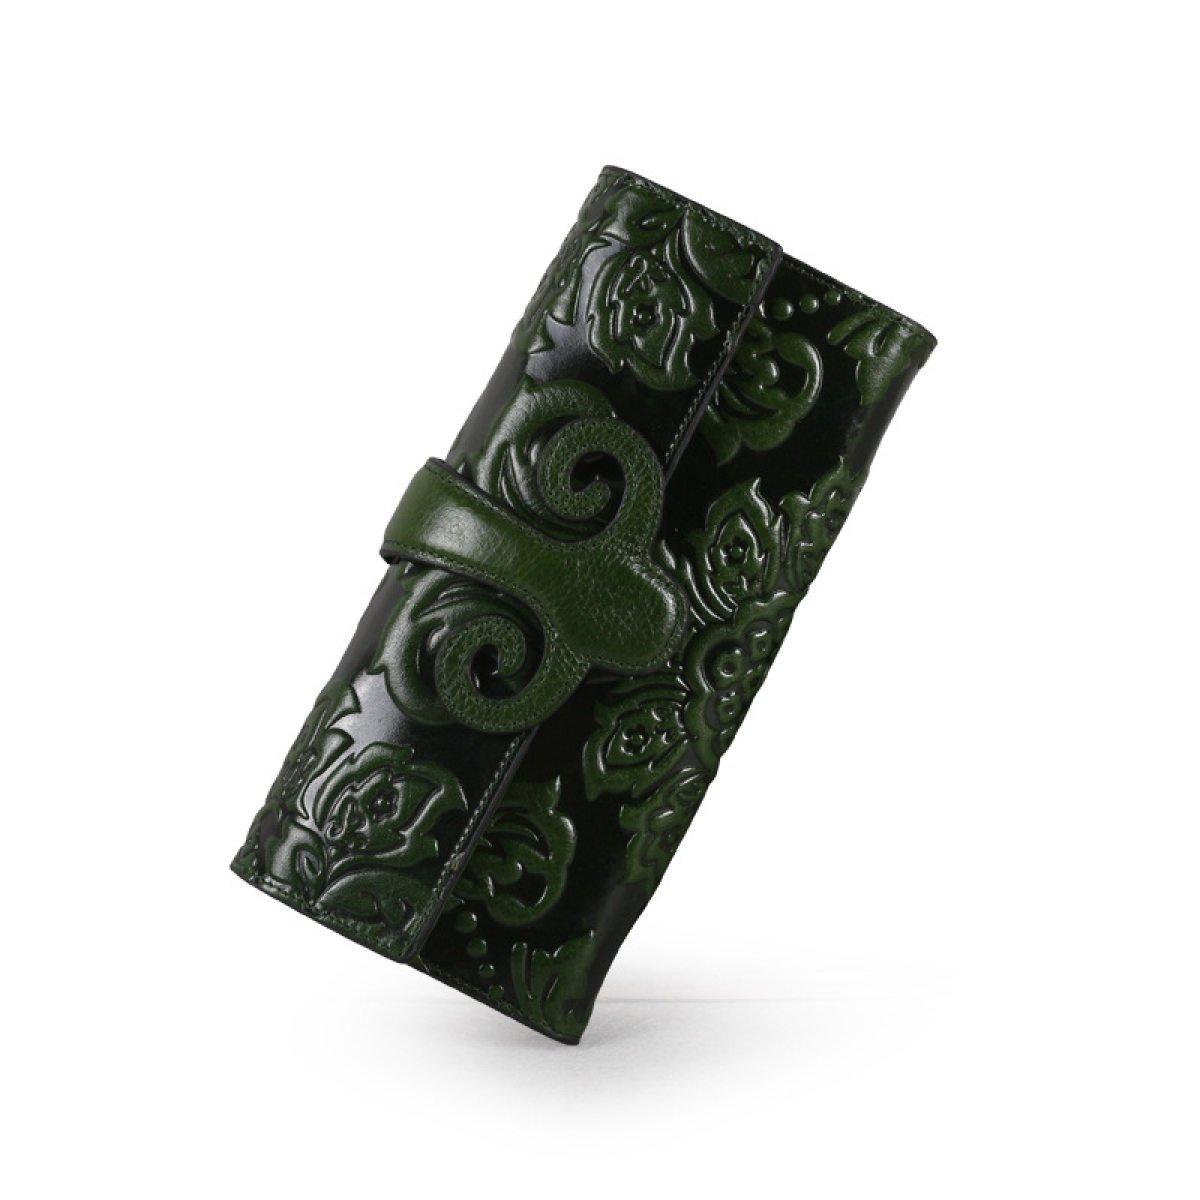 WU ZHI Lady Leder Multi-Card-Position Geld-Clips Brieftaschen B072KWNDS3 Geldbrsen